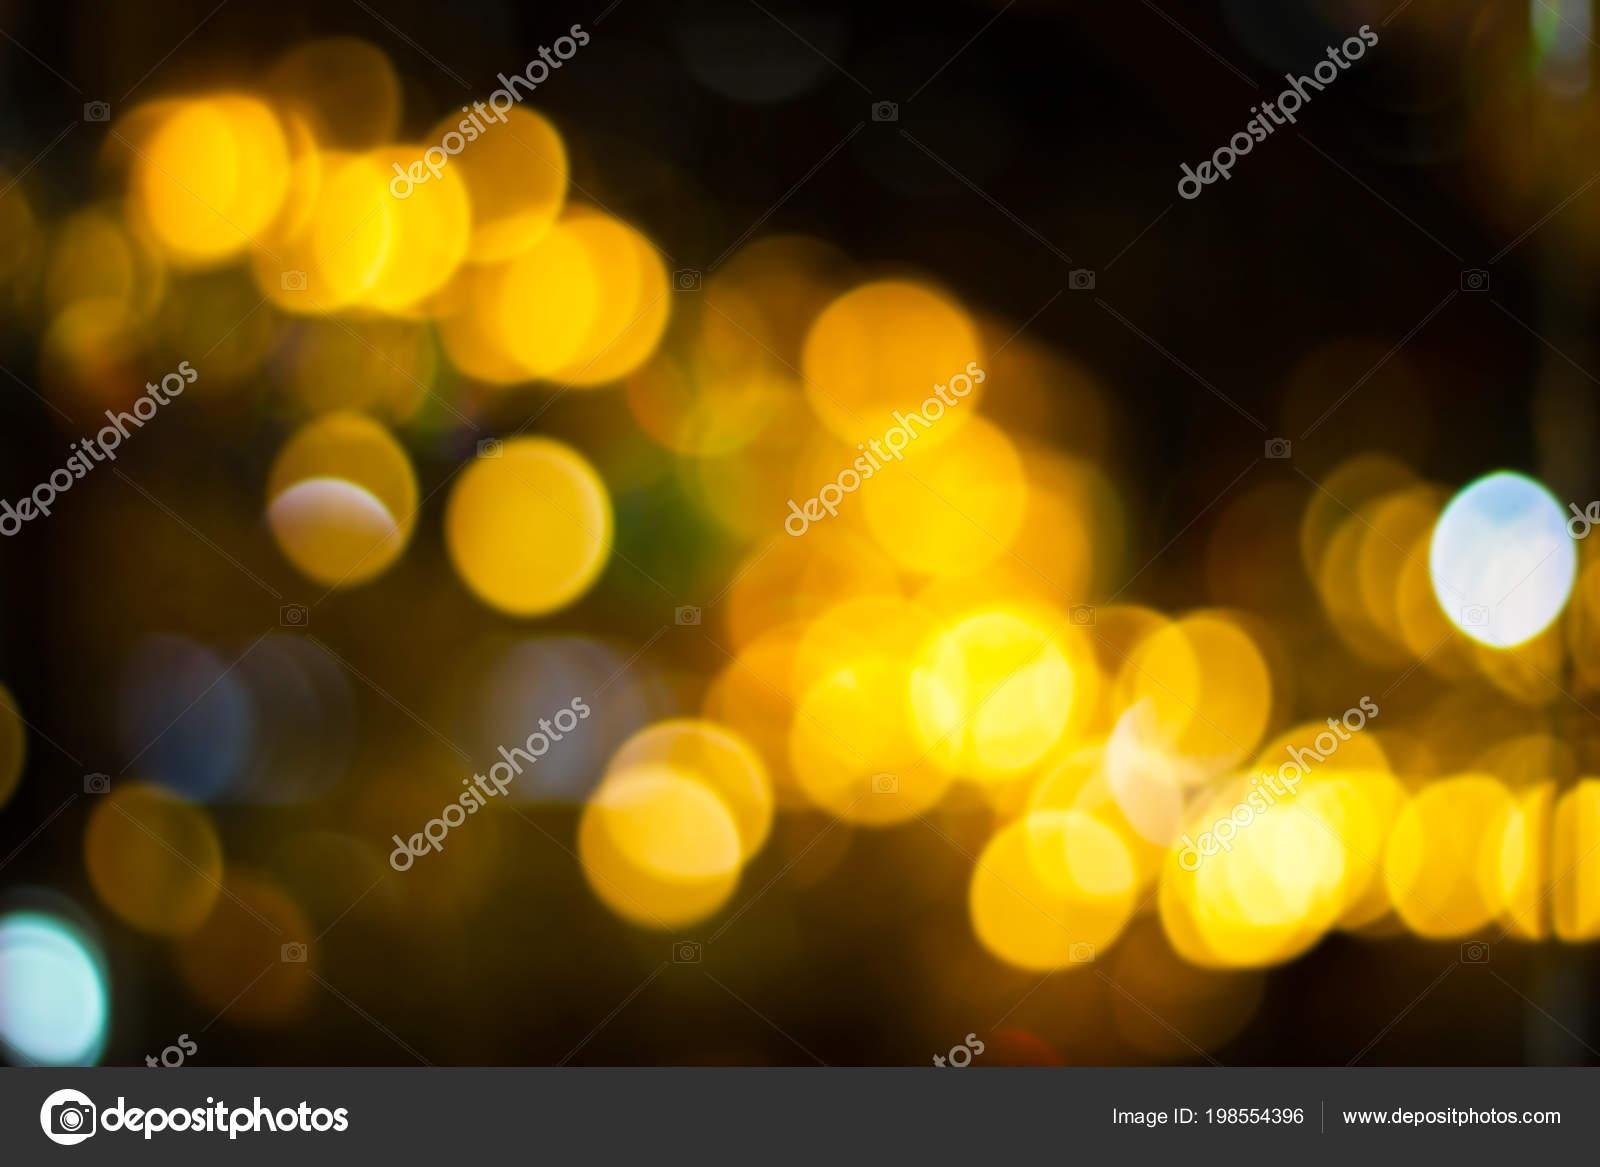 Abstract Bokeh Decorative String Lights